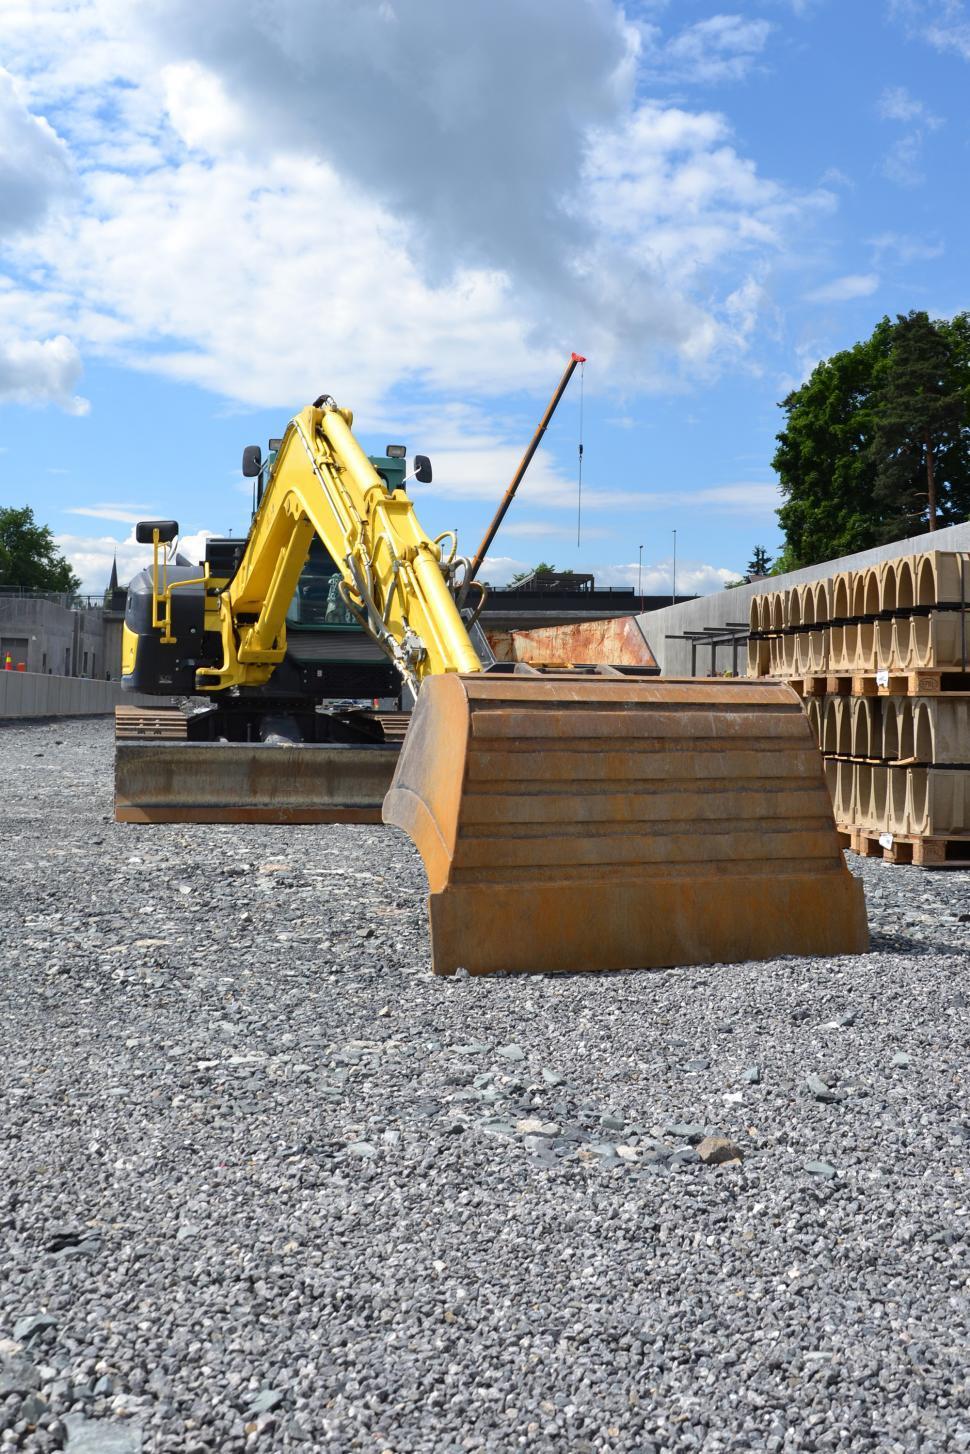 Download Free Stock HD Photo of Yellow excavator  Online